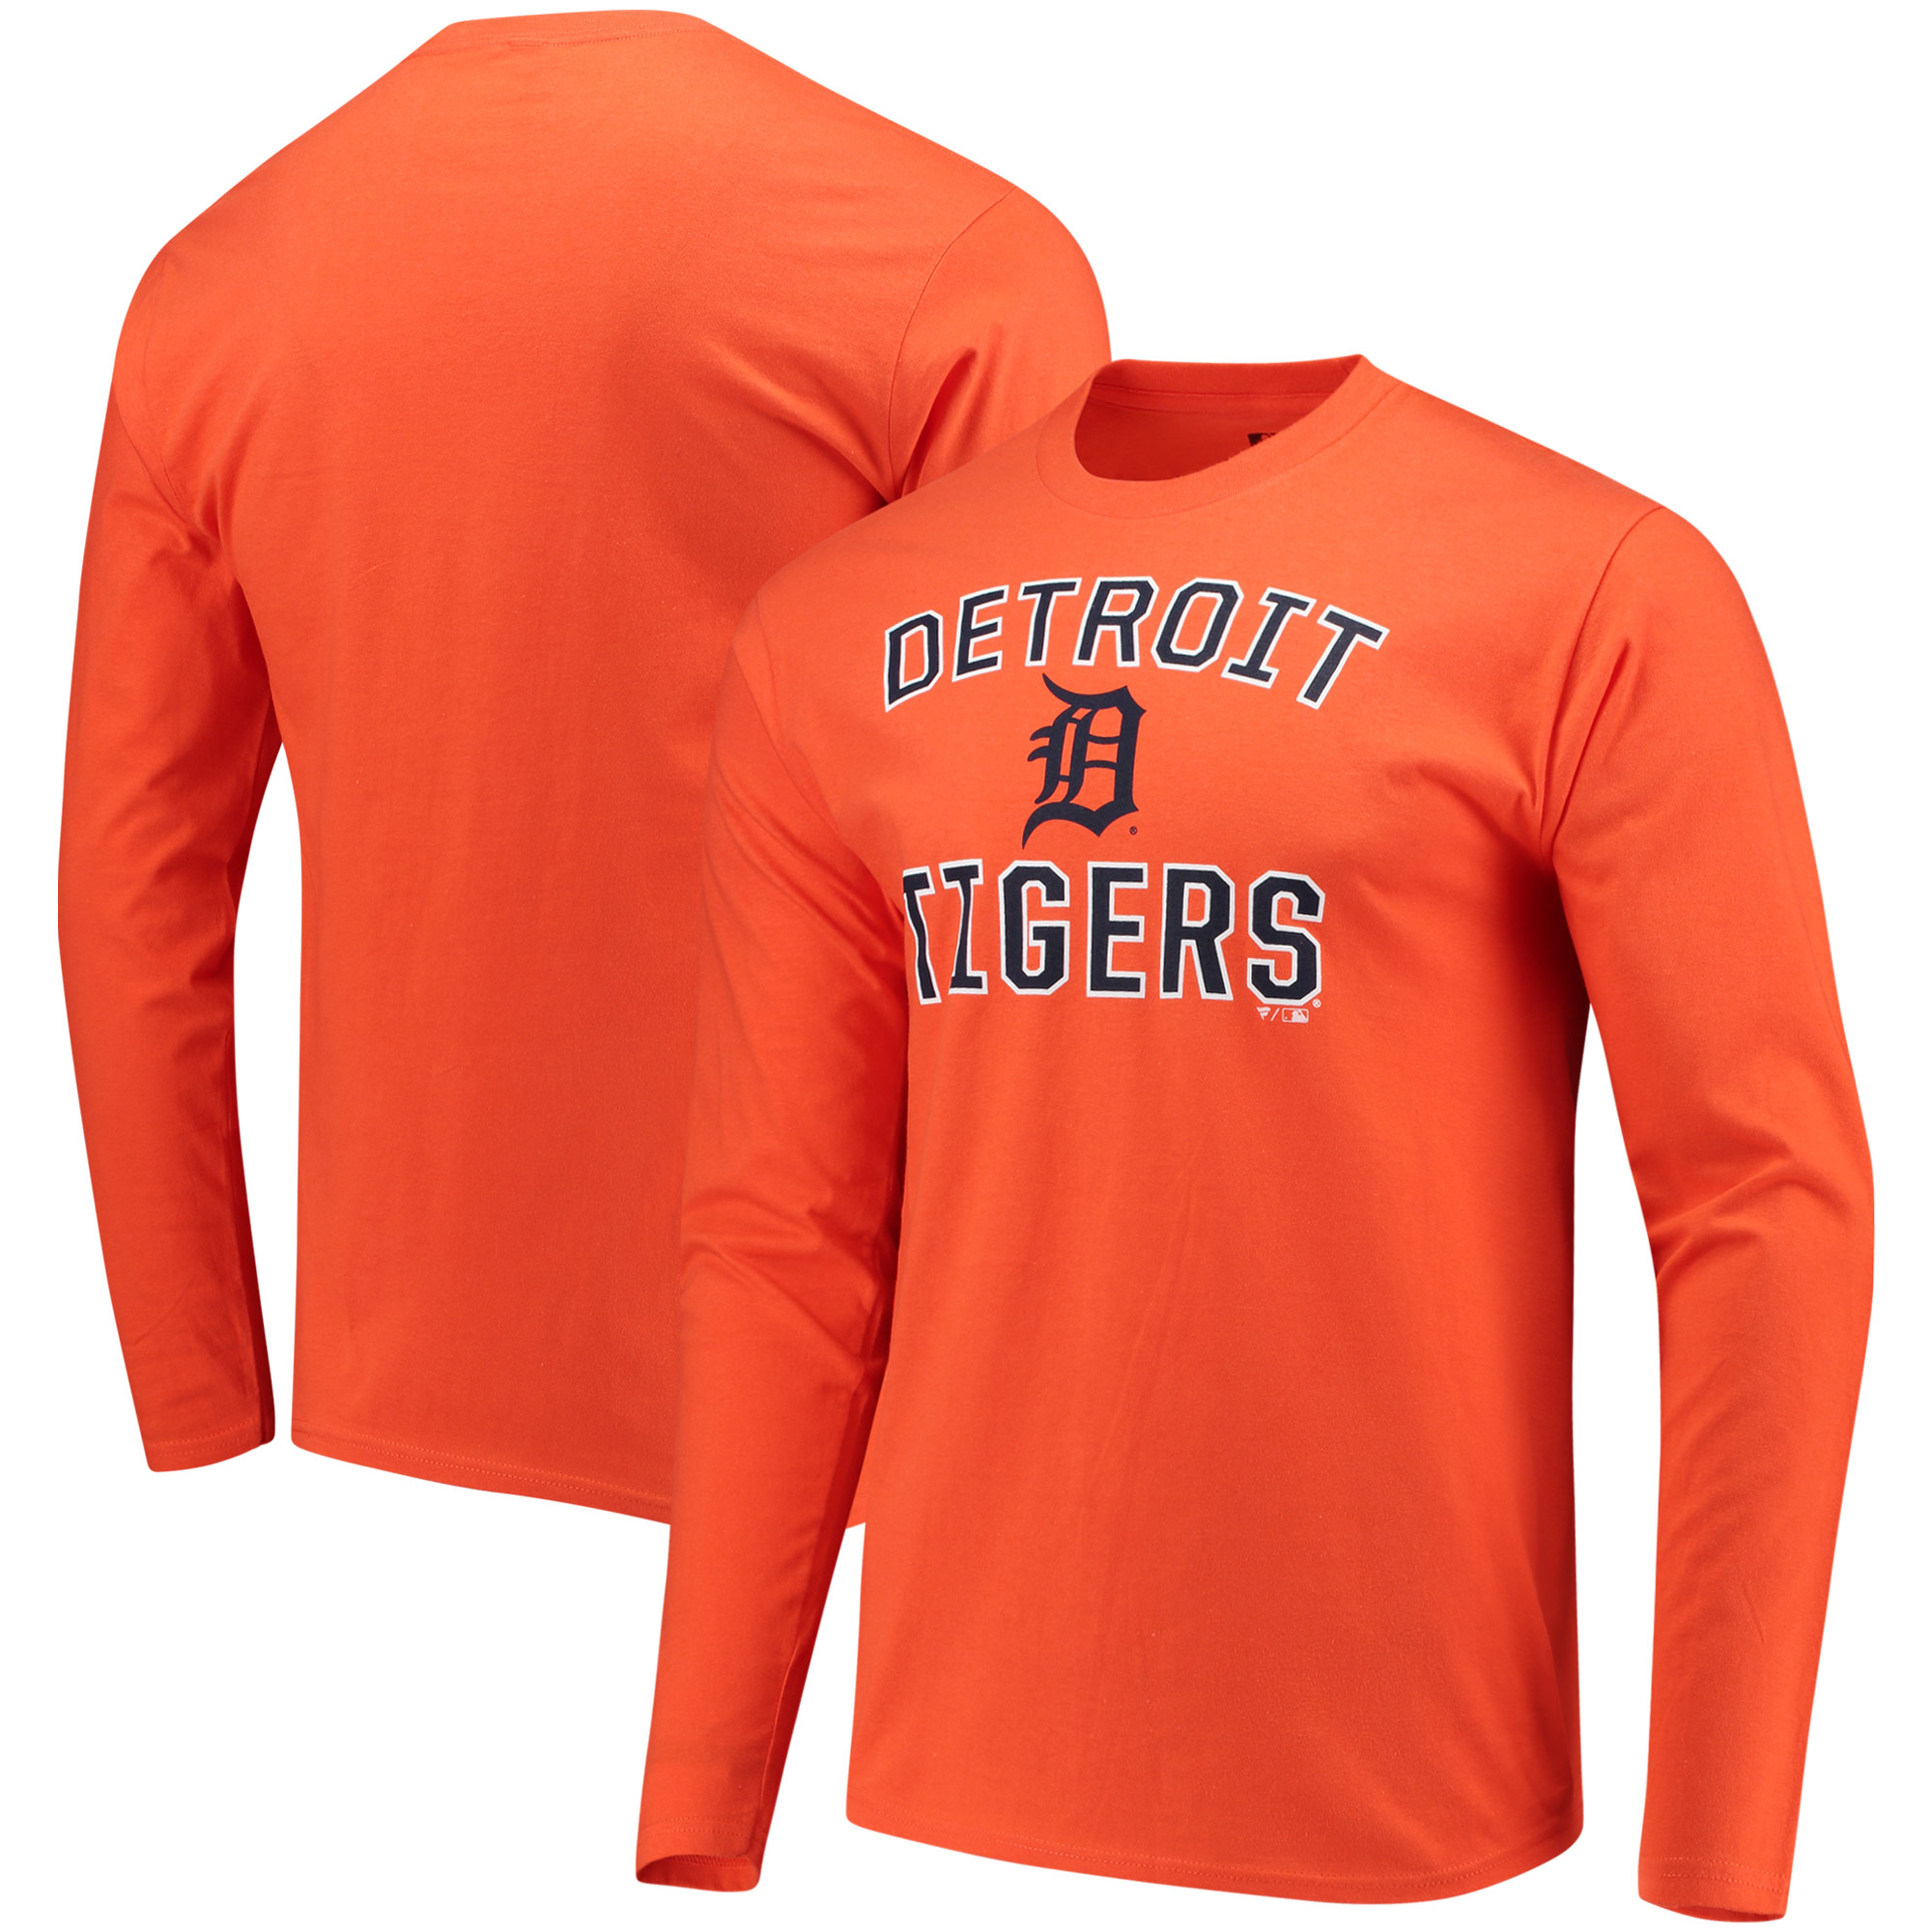 Detroit Tigers Fanatics Branded Victory Arch Long Sleeve T-Shirt - Orange